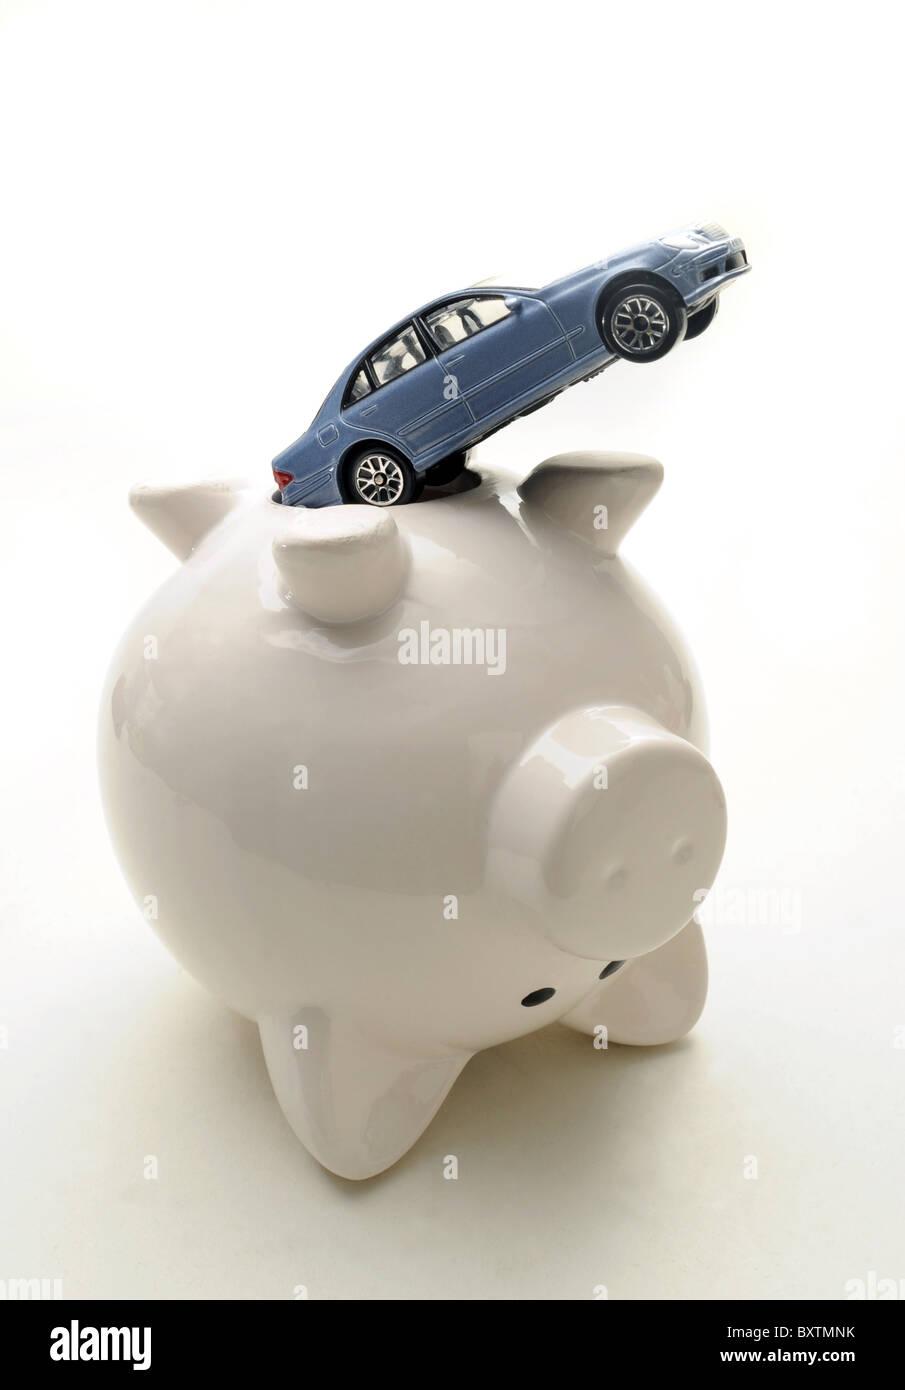 UPTURNED PIGGY BANK WITH CAR RE MOTORING RUNNING REPAIR COSTS BILLS  FUEL  INSURANCE PRICES GARAGE ETC UK - Stock Image